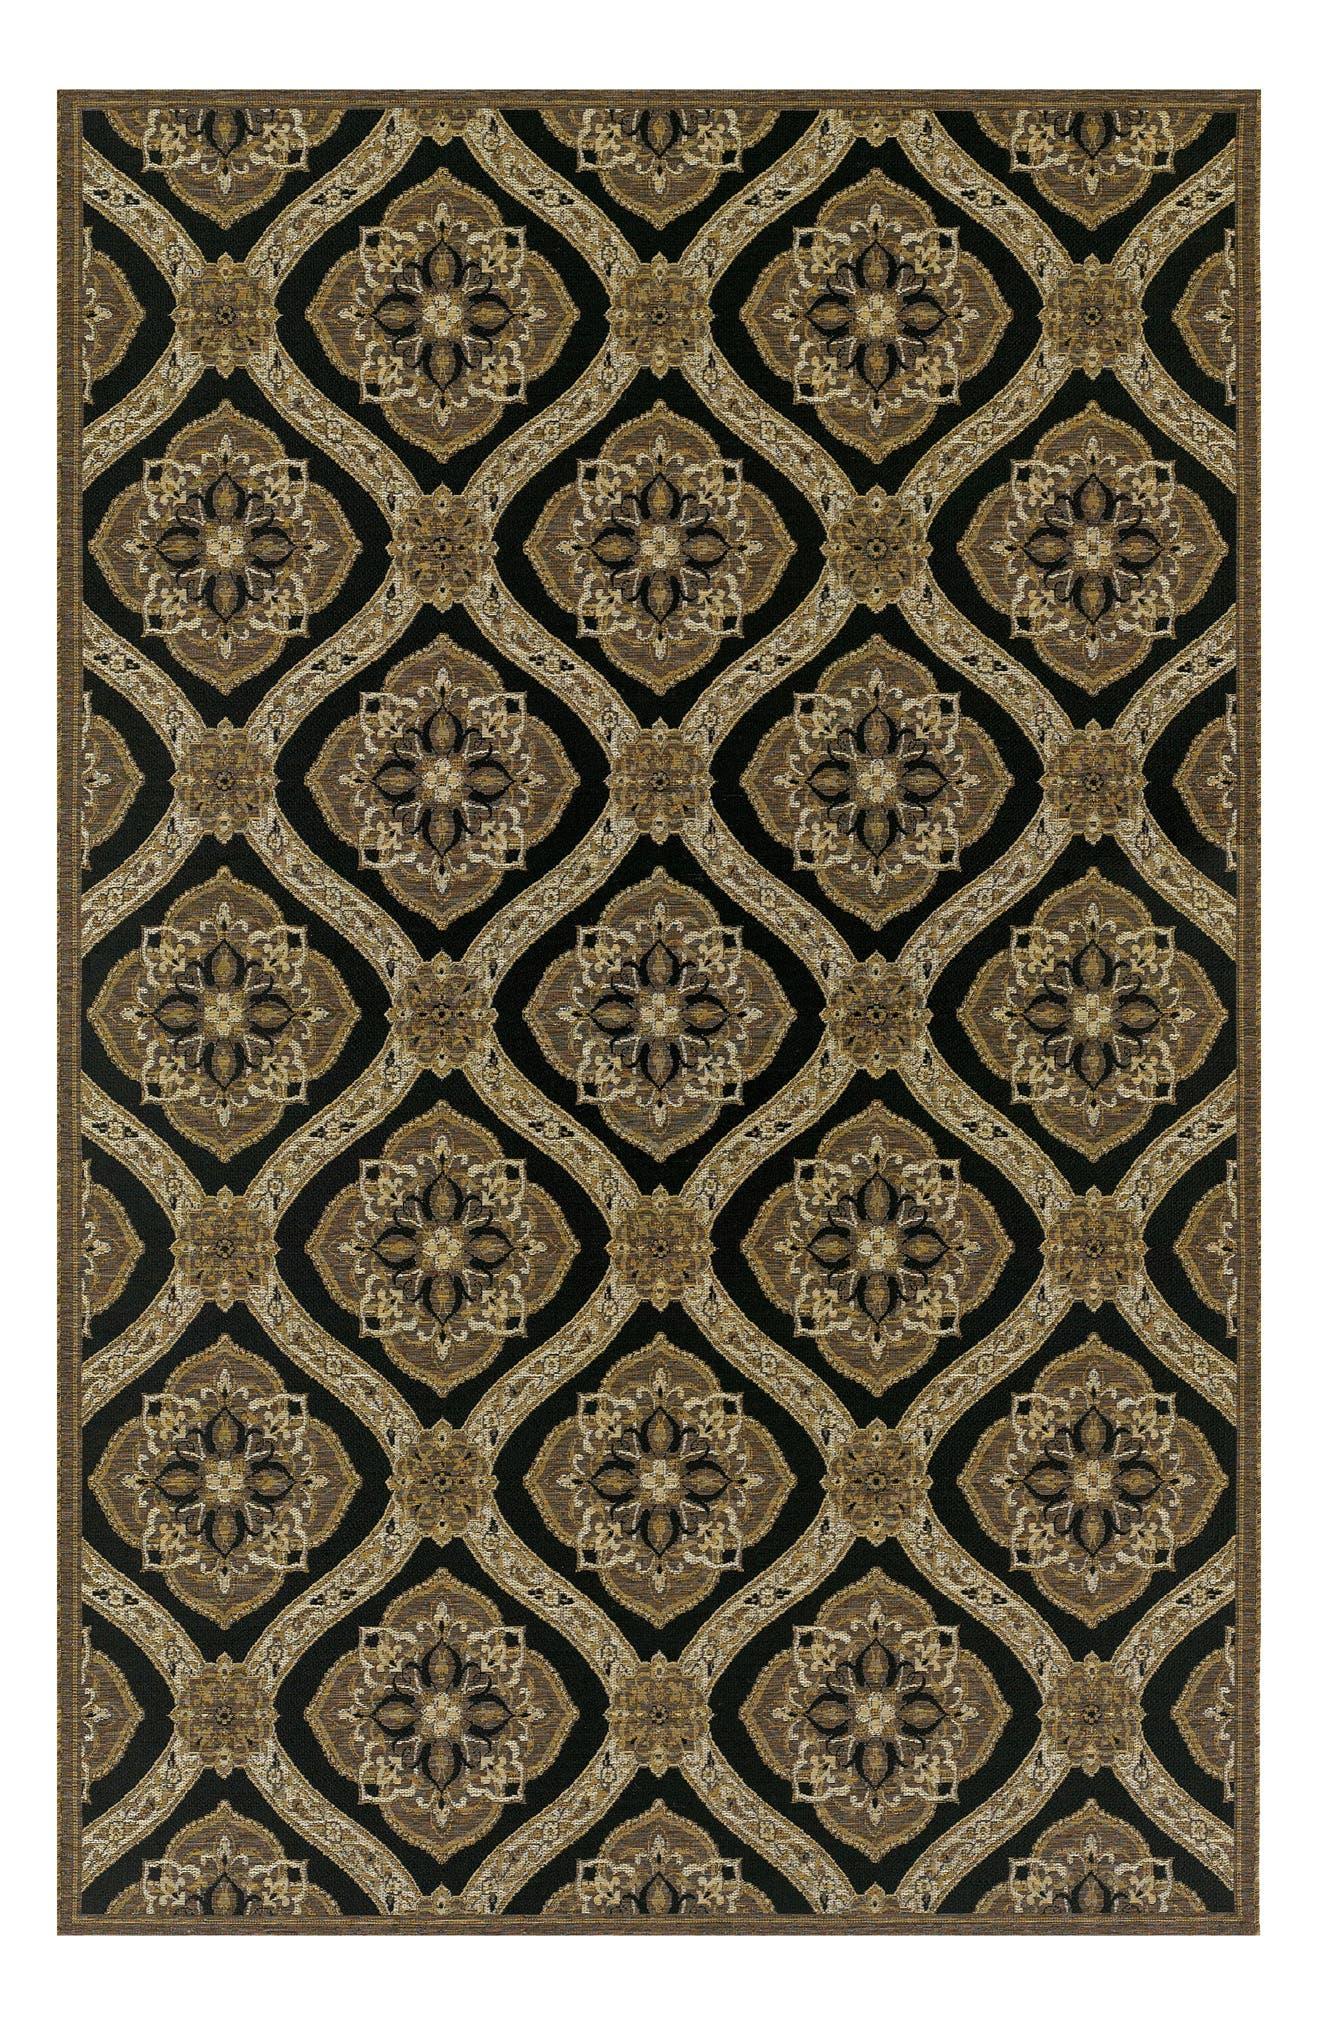 Napoli Indoor/Outdoor Rug,                             Main thumbnail 1, color,                             Black/ Gold